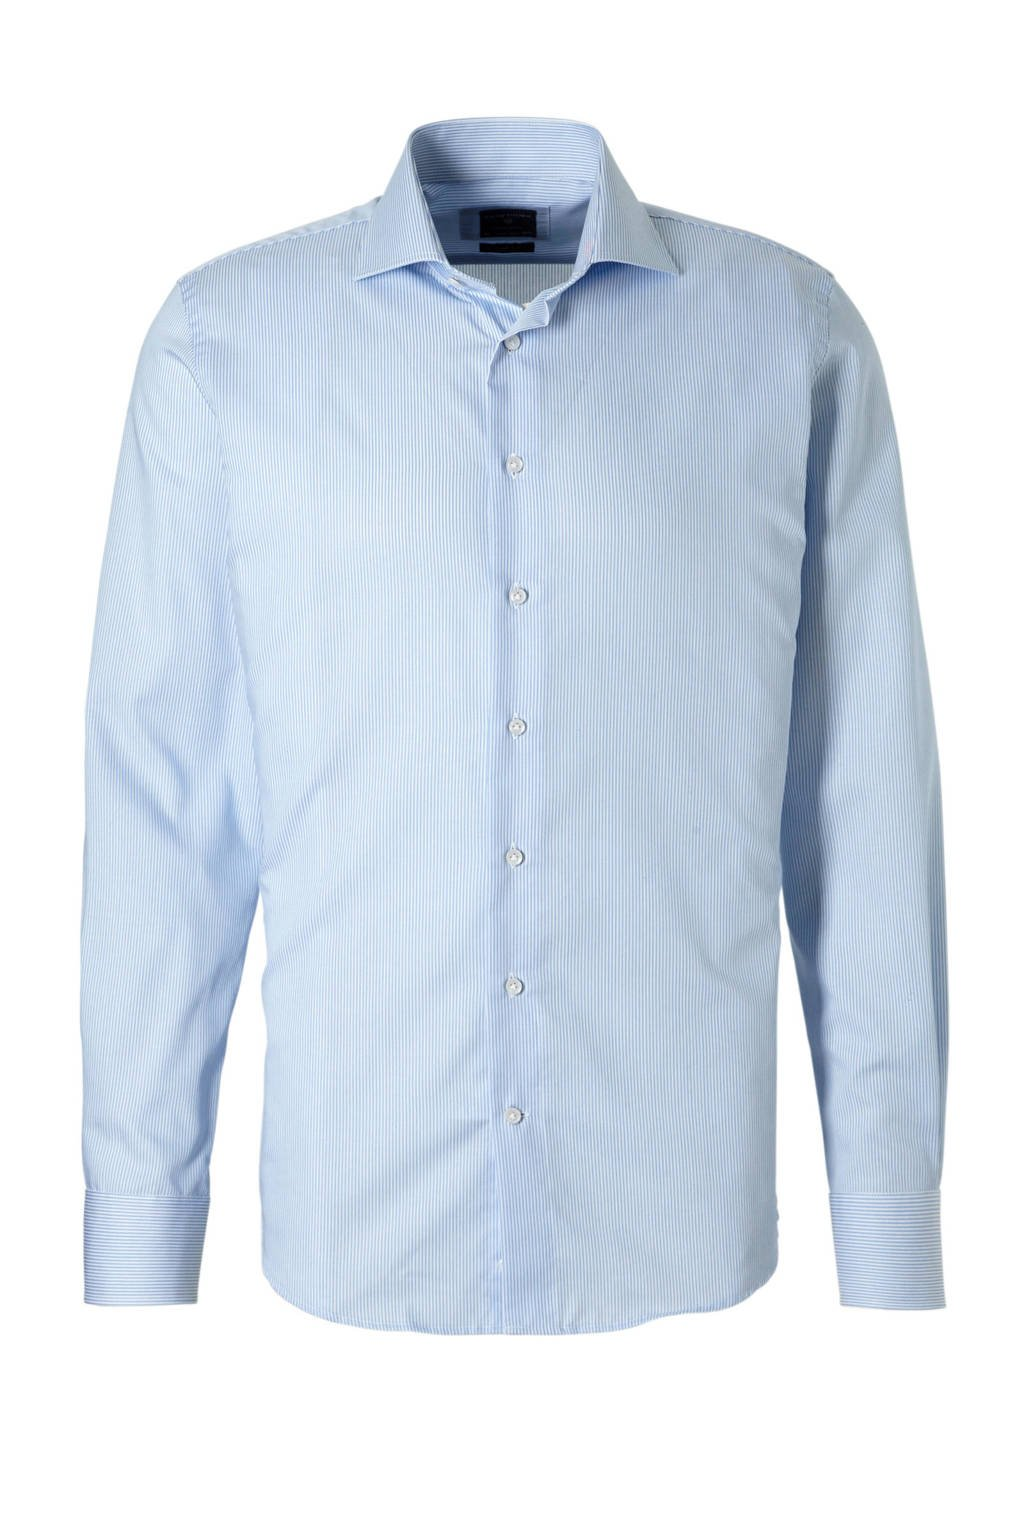 Profuomo slim fit overhemd, Blauw, wit